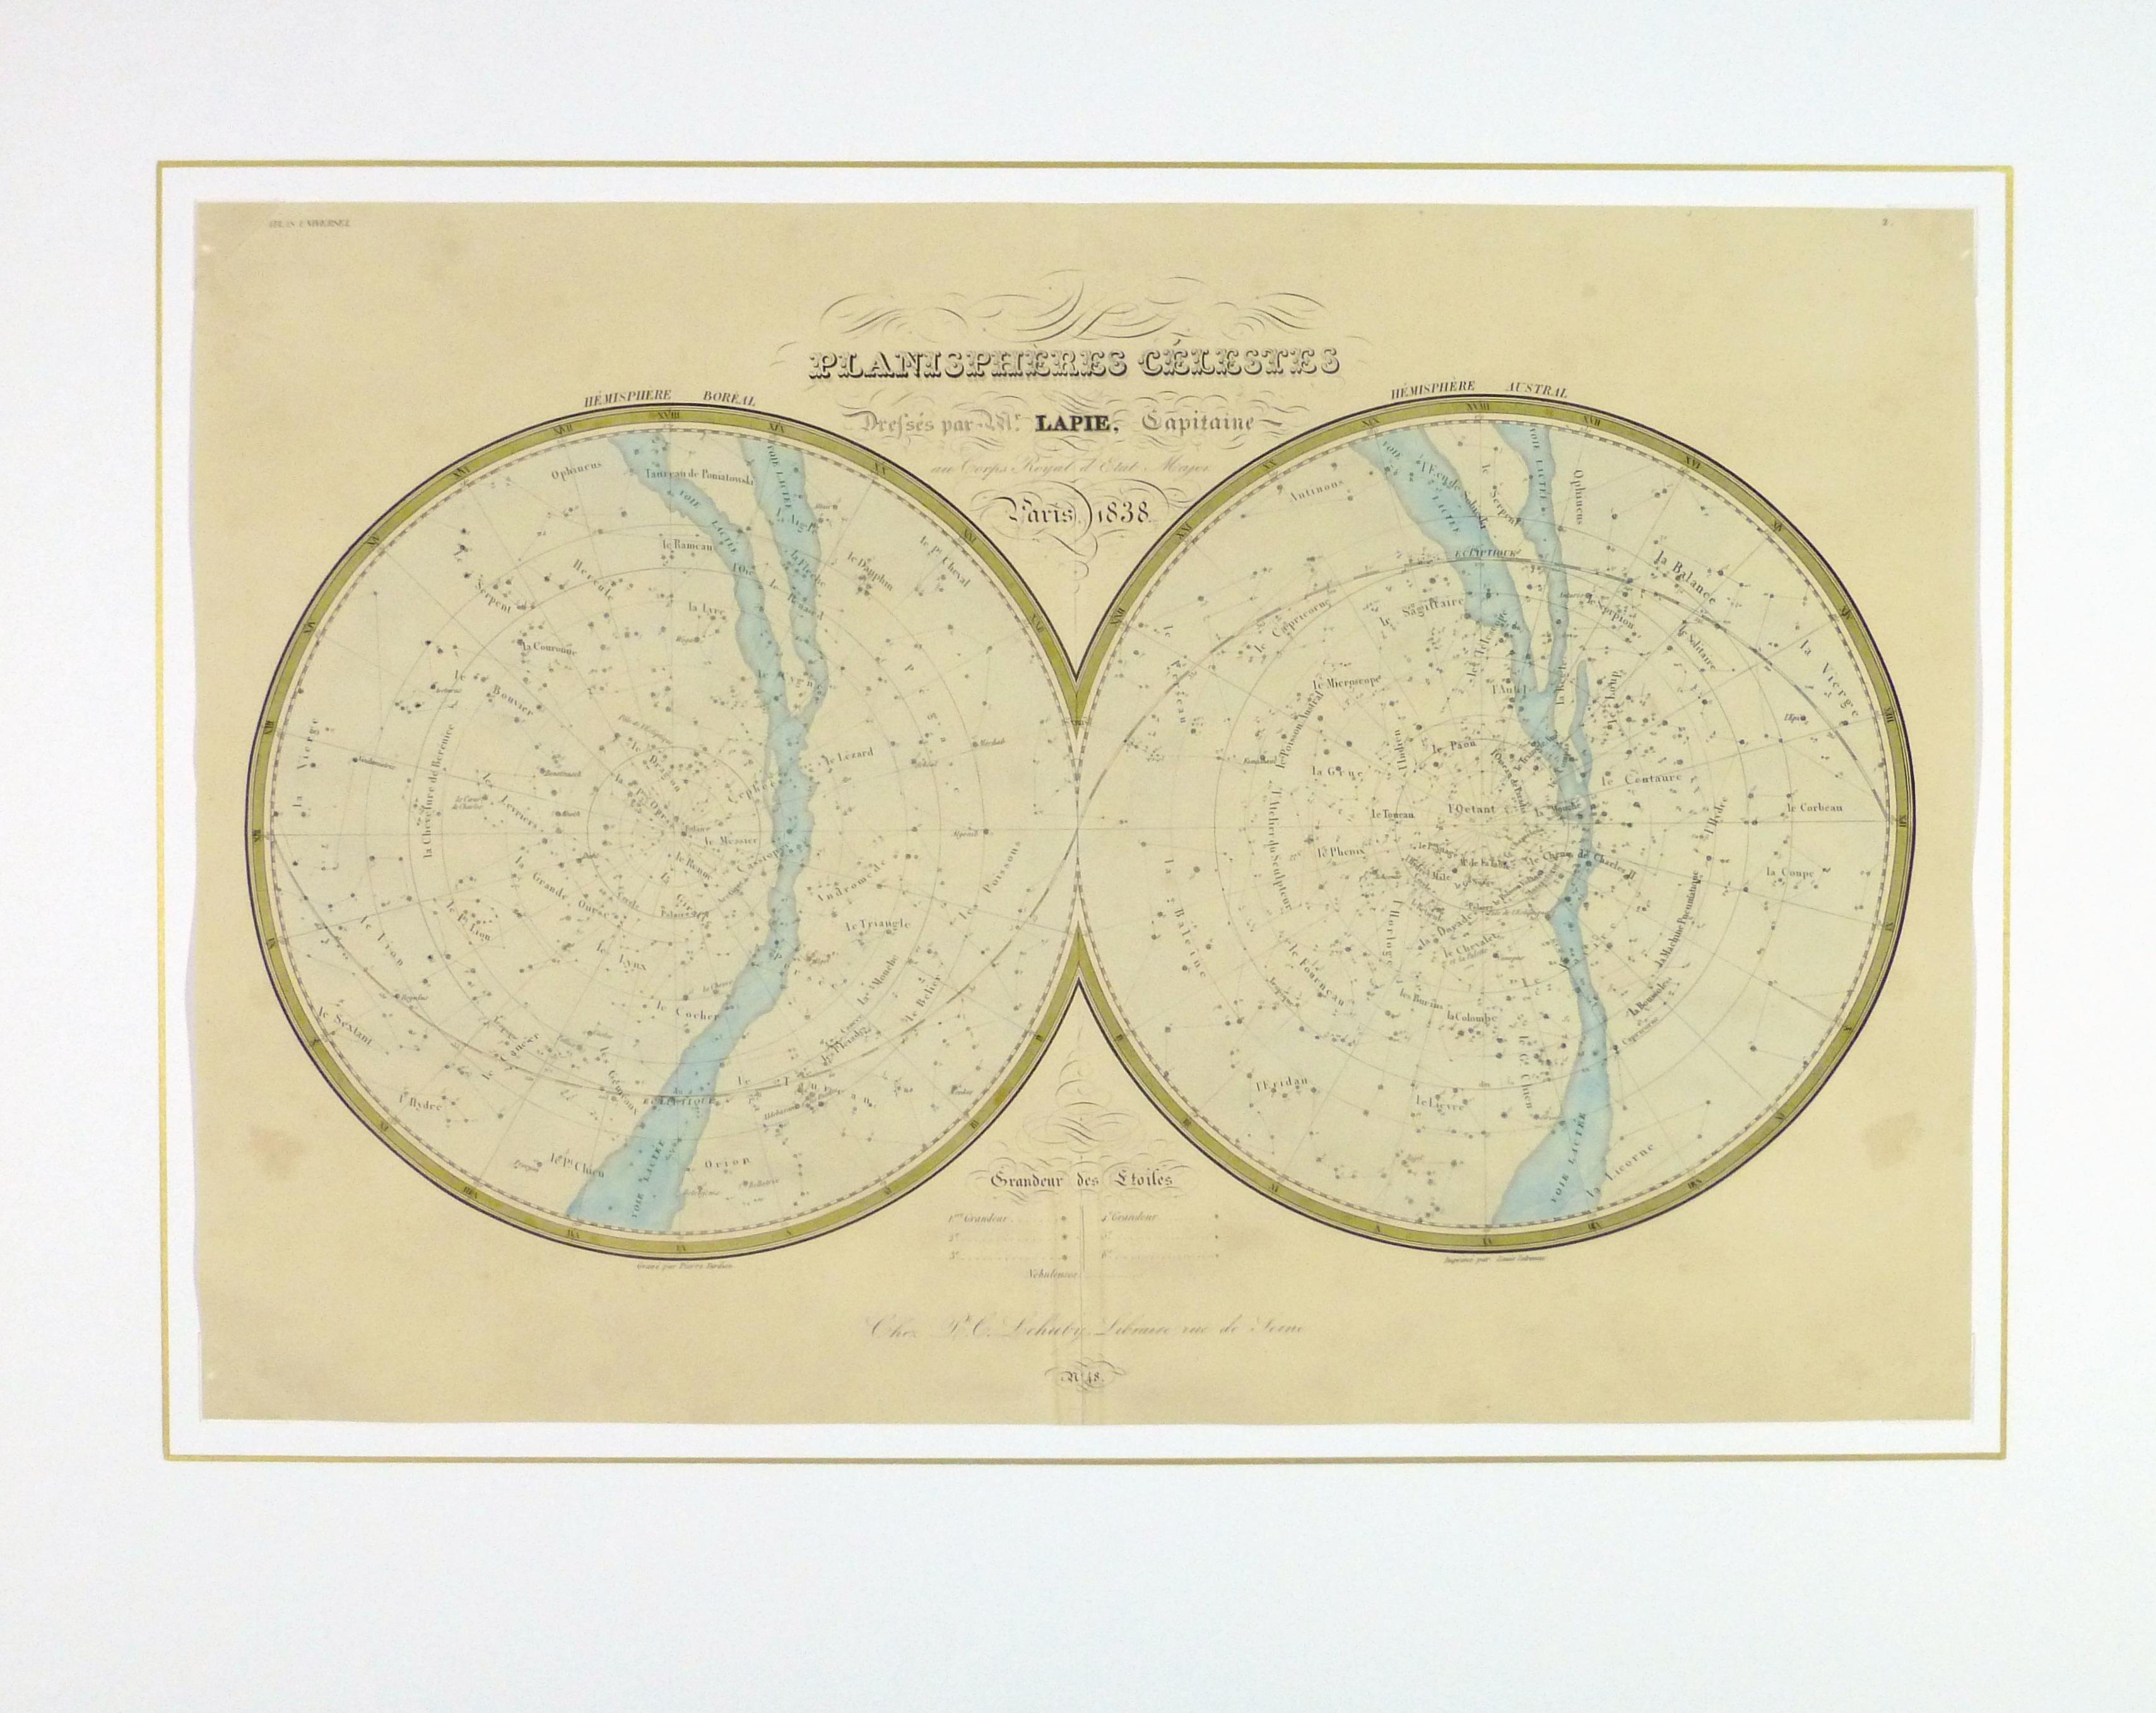 Celestial Planispheres Engraving, 1838-matted-10371M